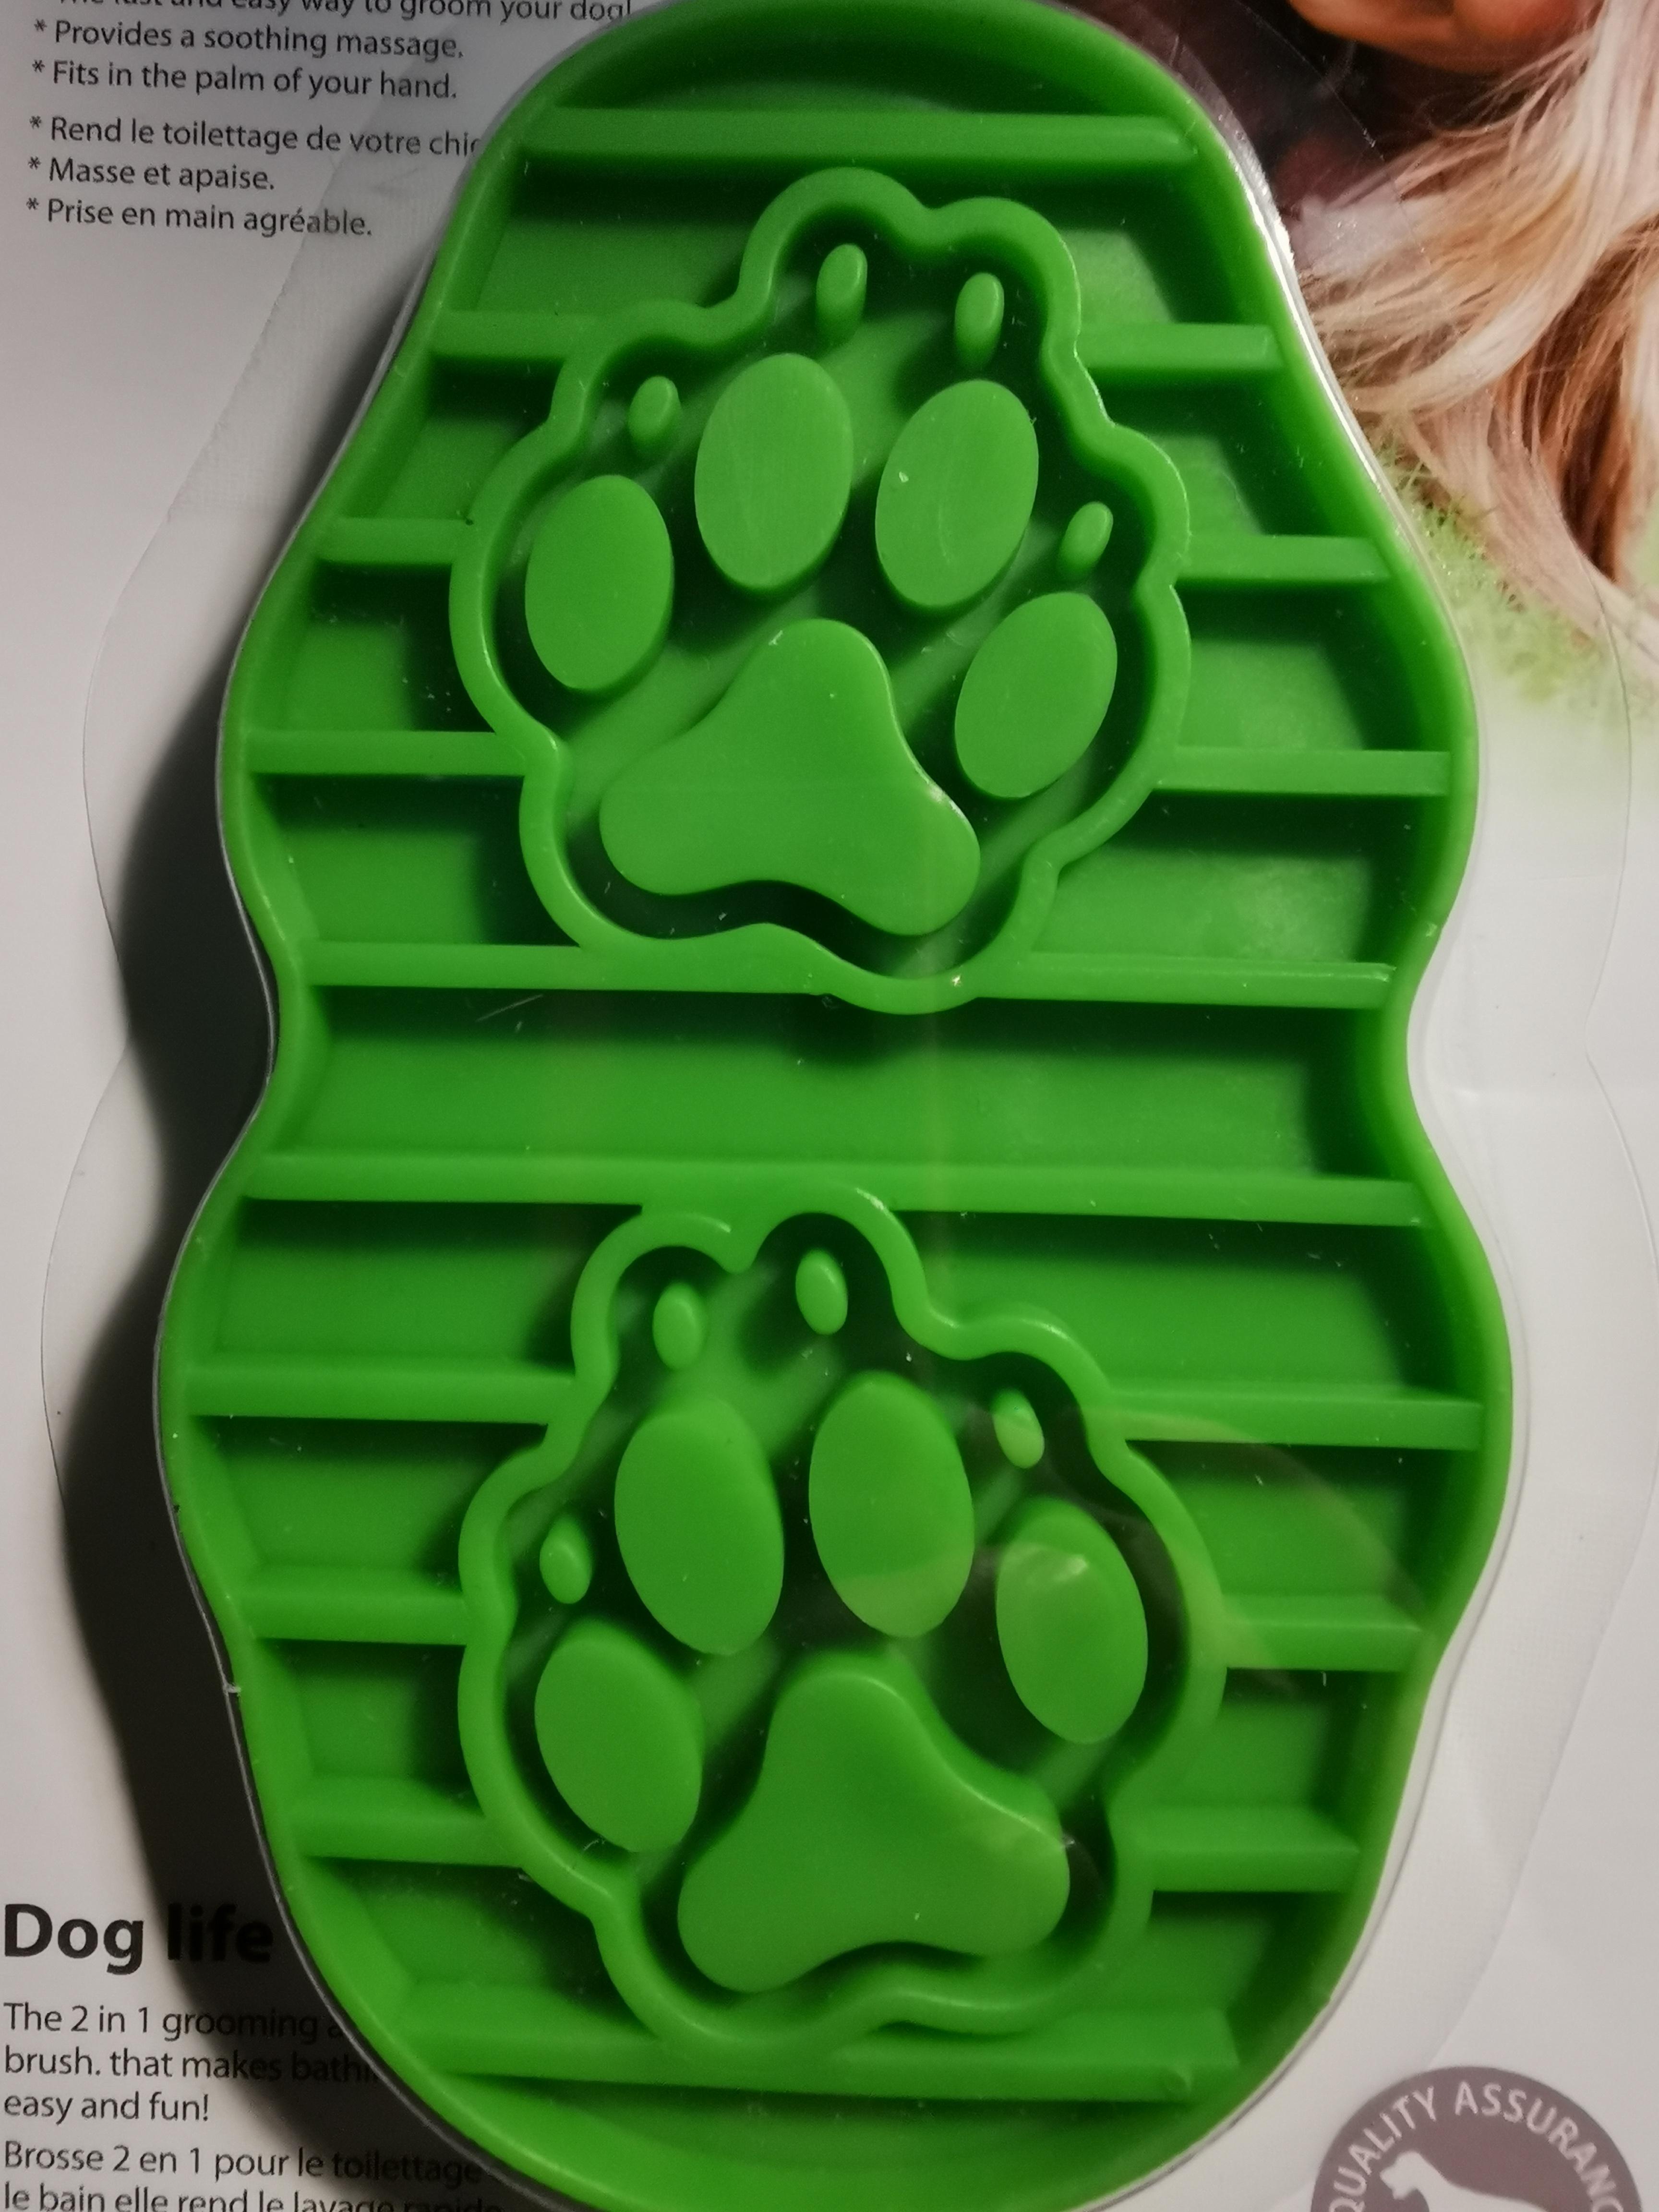 Pawise Dog Brush Hundebürste